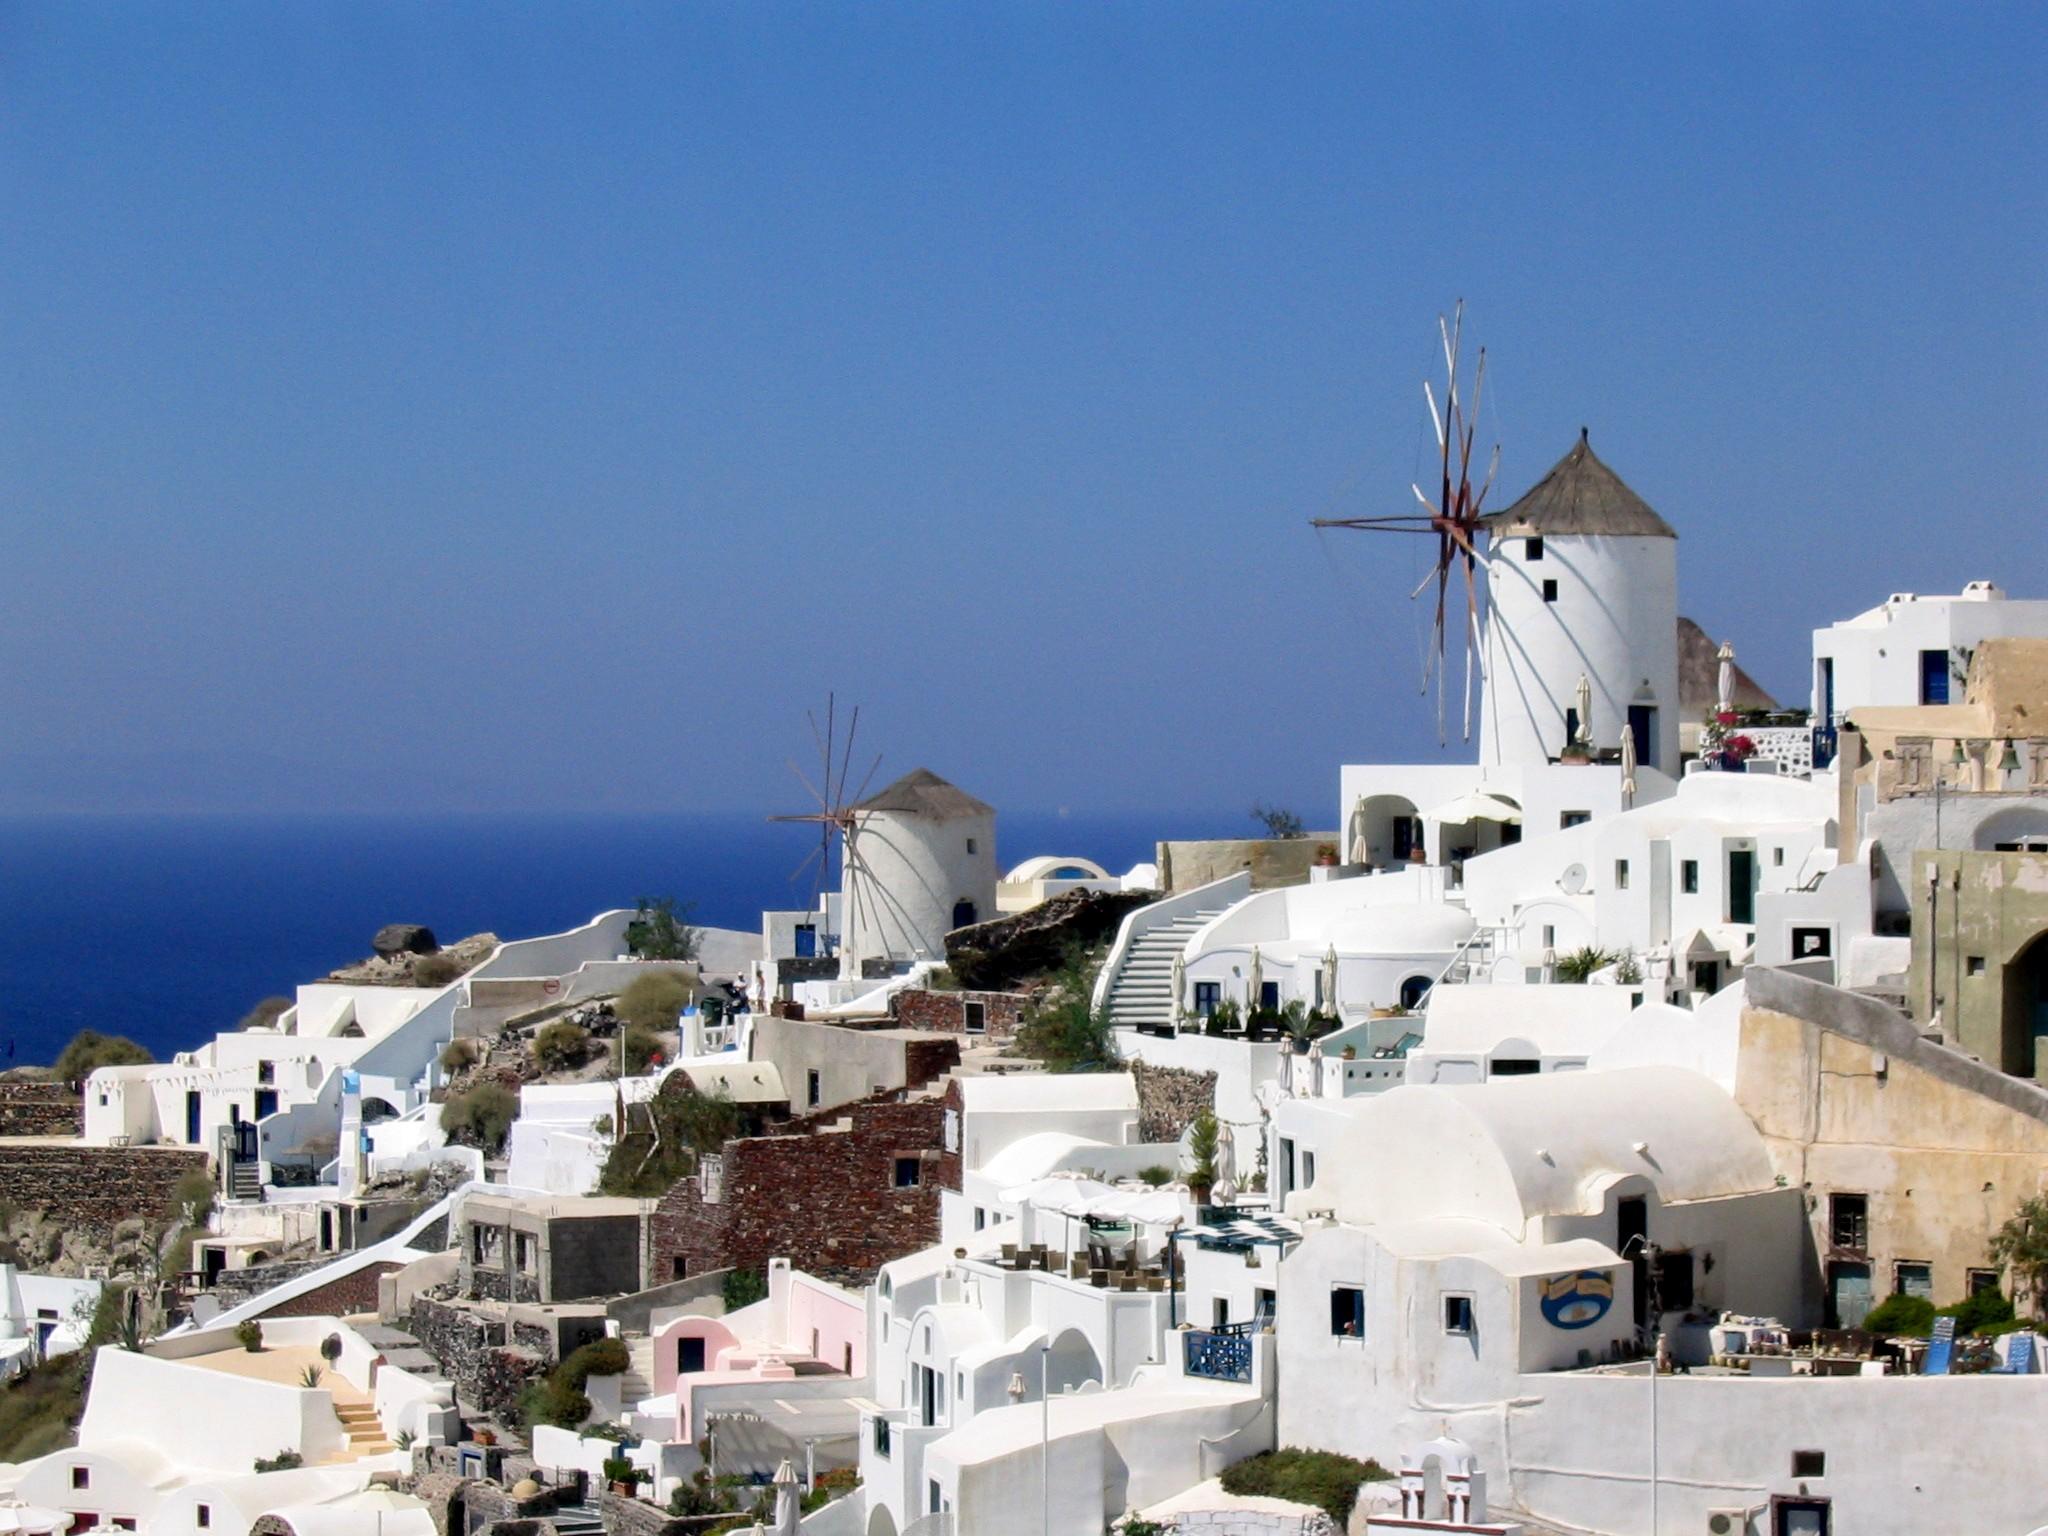 File:Santorini Oia Windmills.JPG - Wikimedia Commons